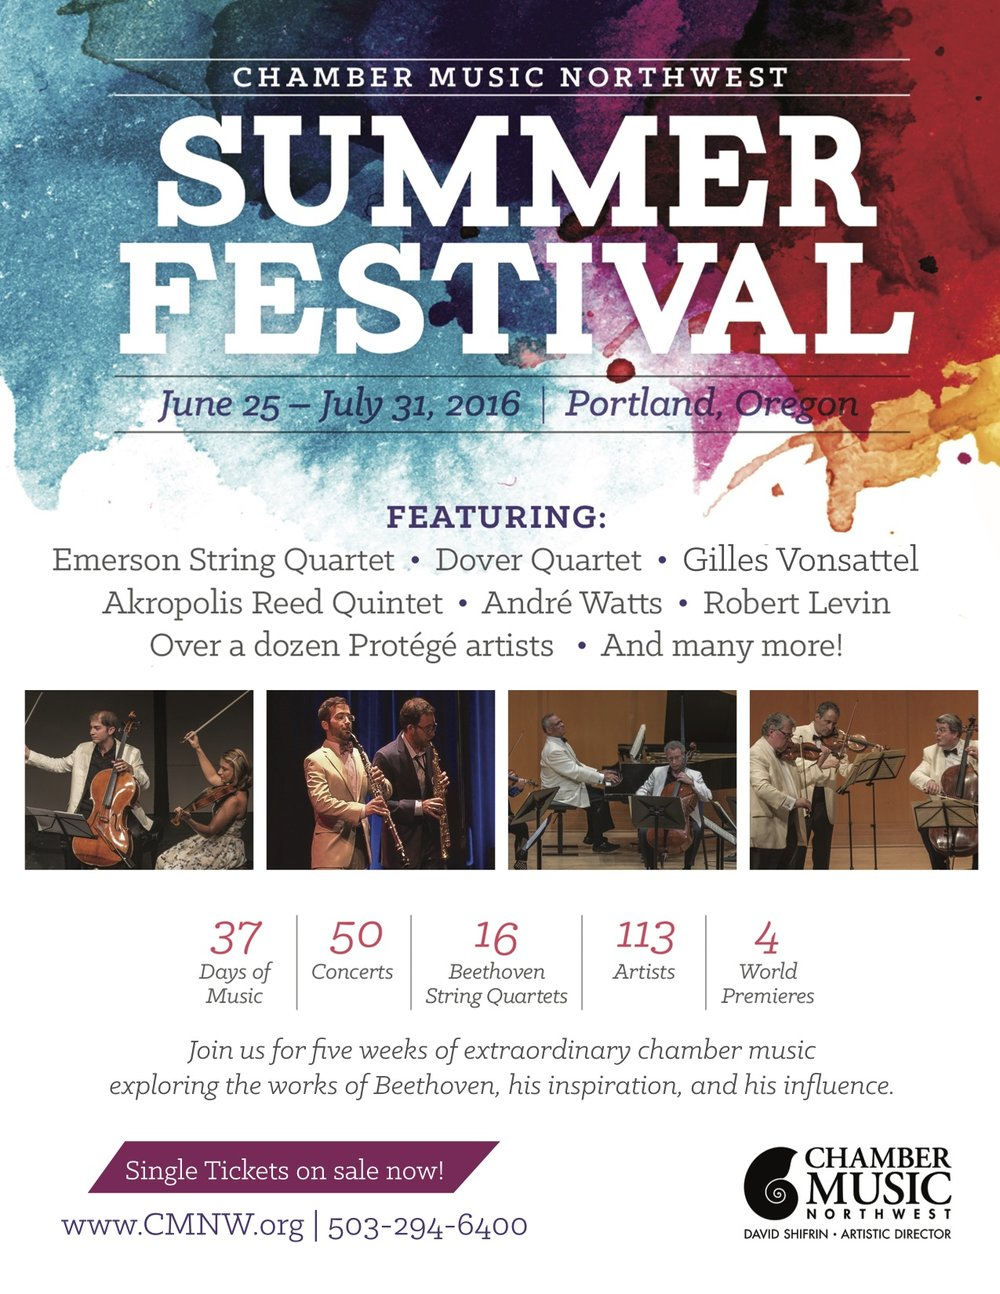 SummerFestival_24.jpg